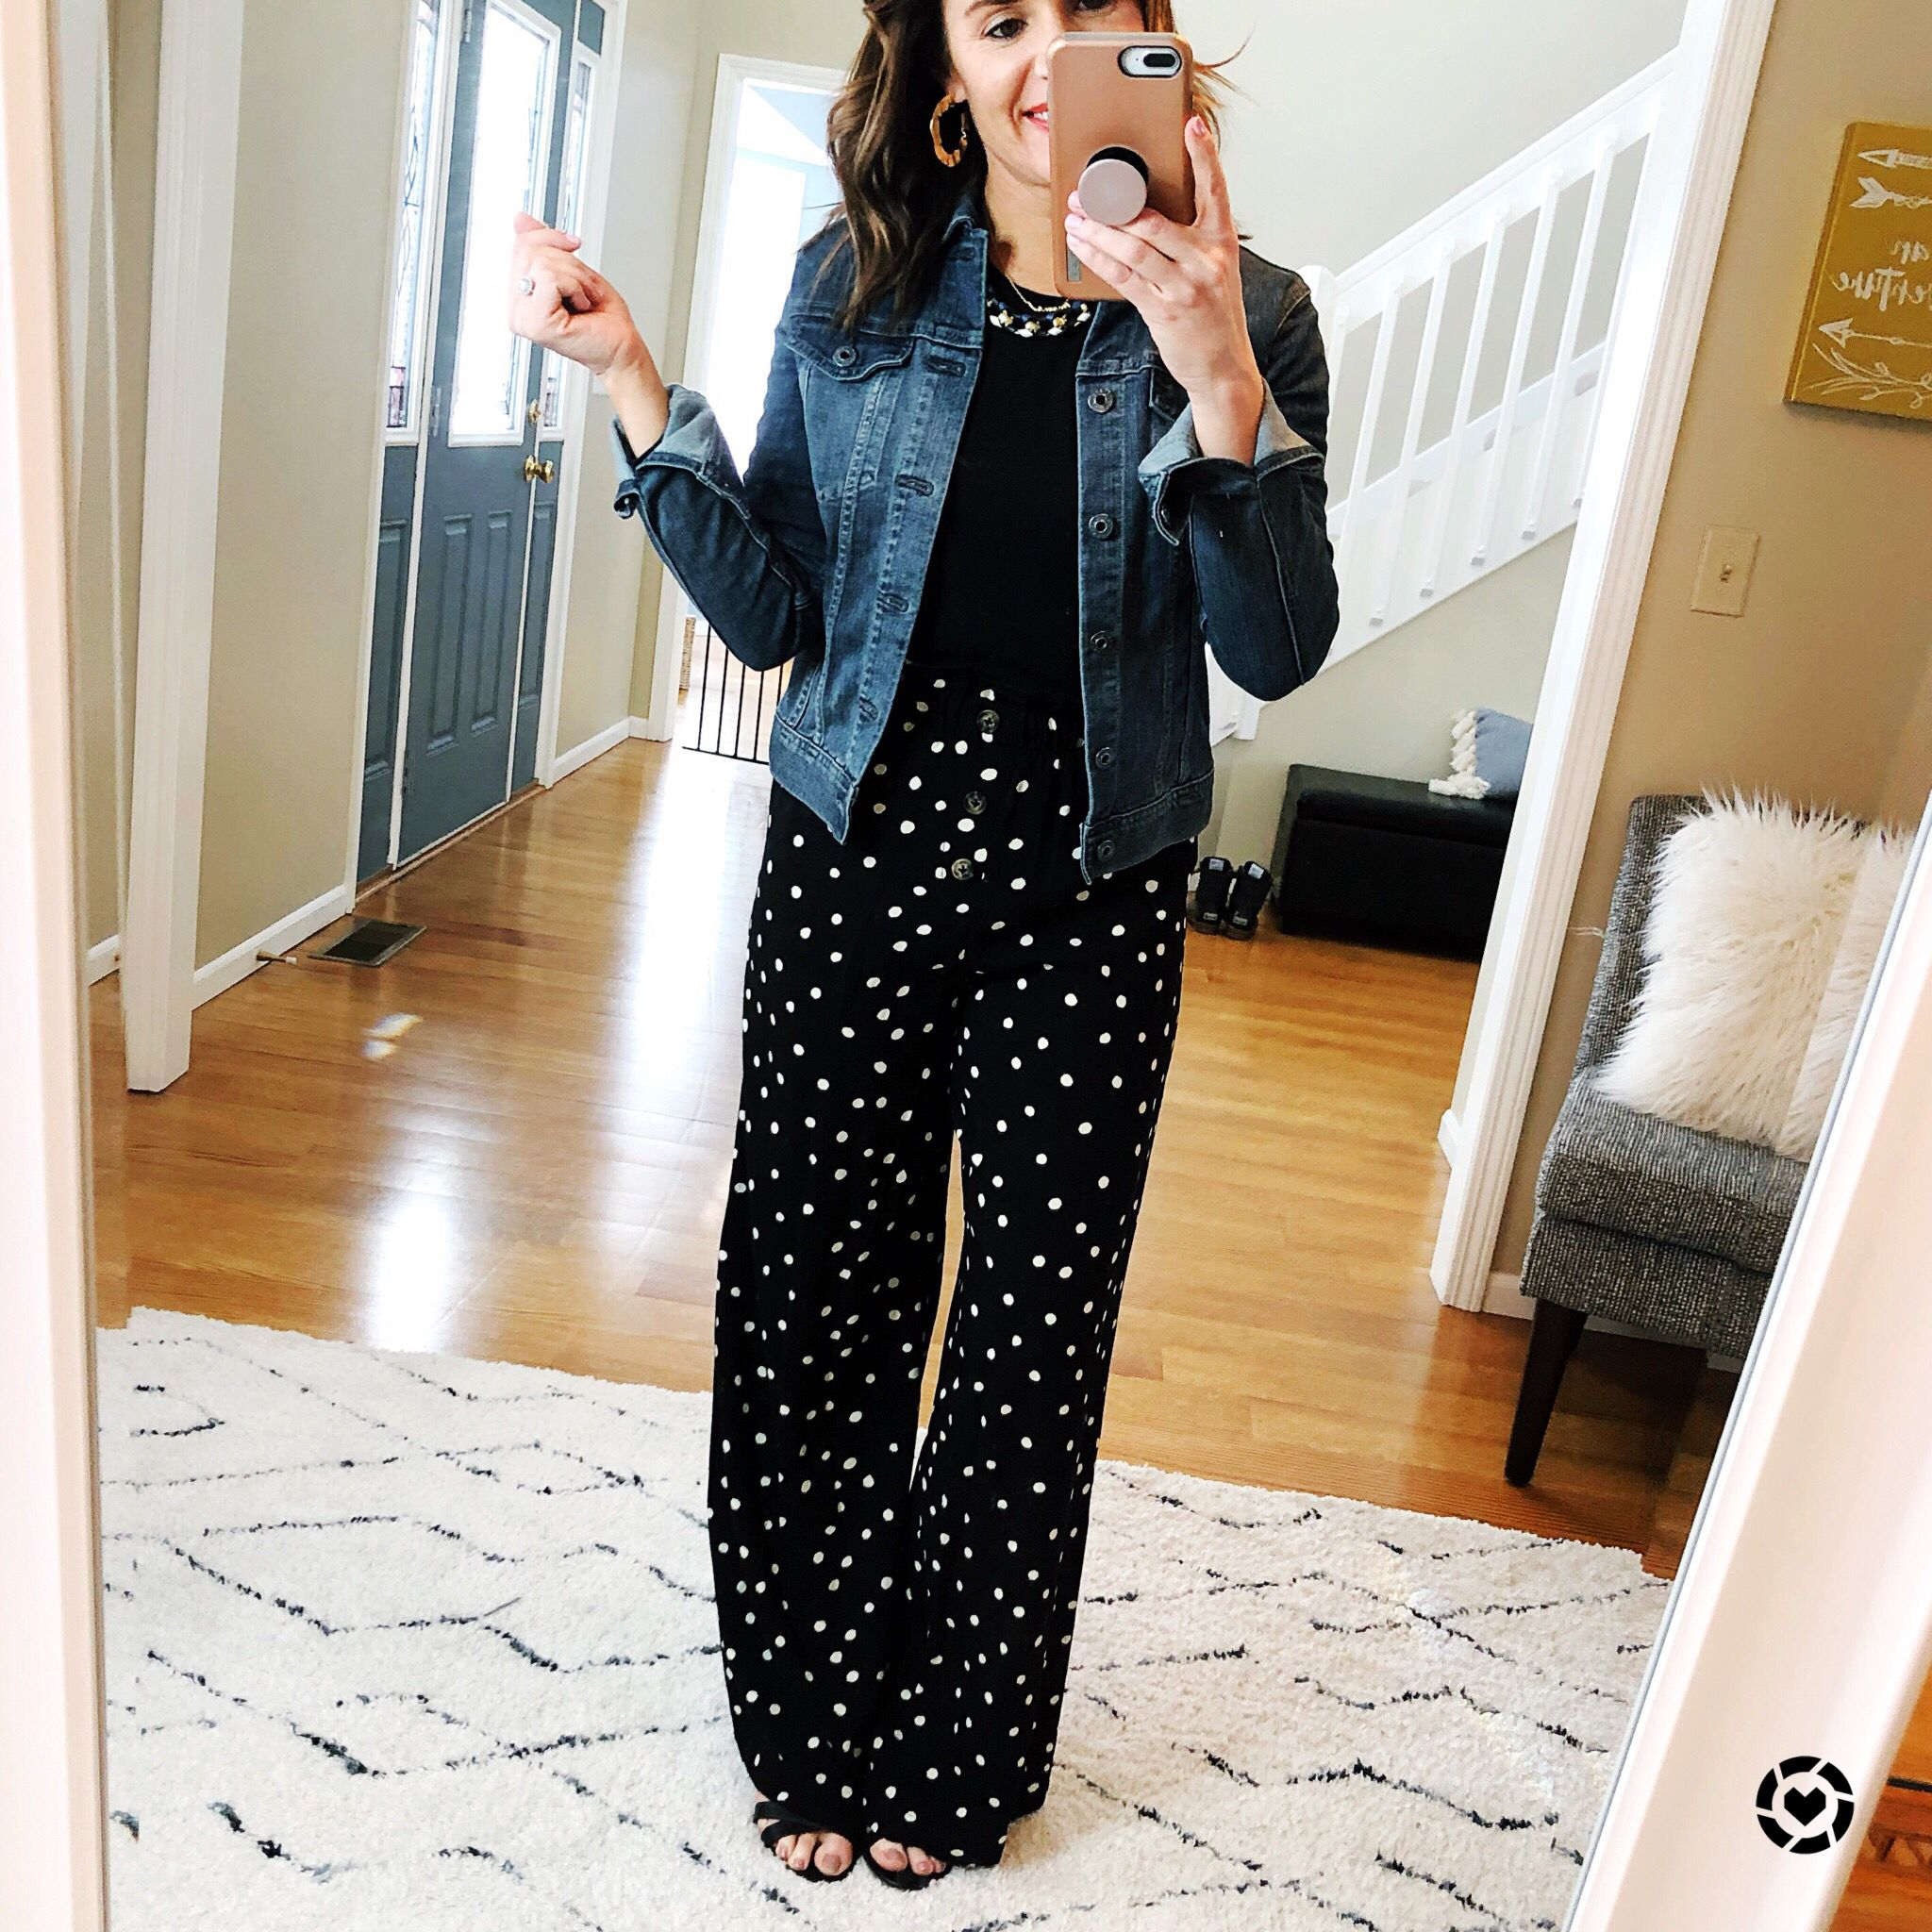 Polka Dot Wide Leg Pants Polka Dot Pants Outfit Dots Outfit Outfits [ 2048 x 2048 Pixel ]